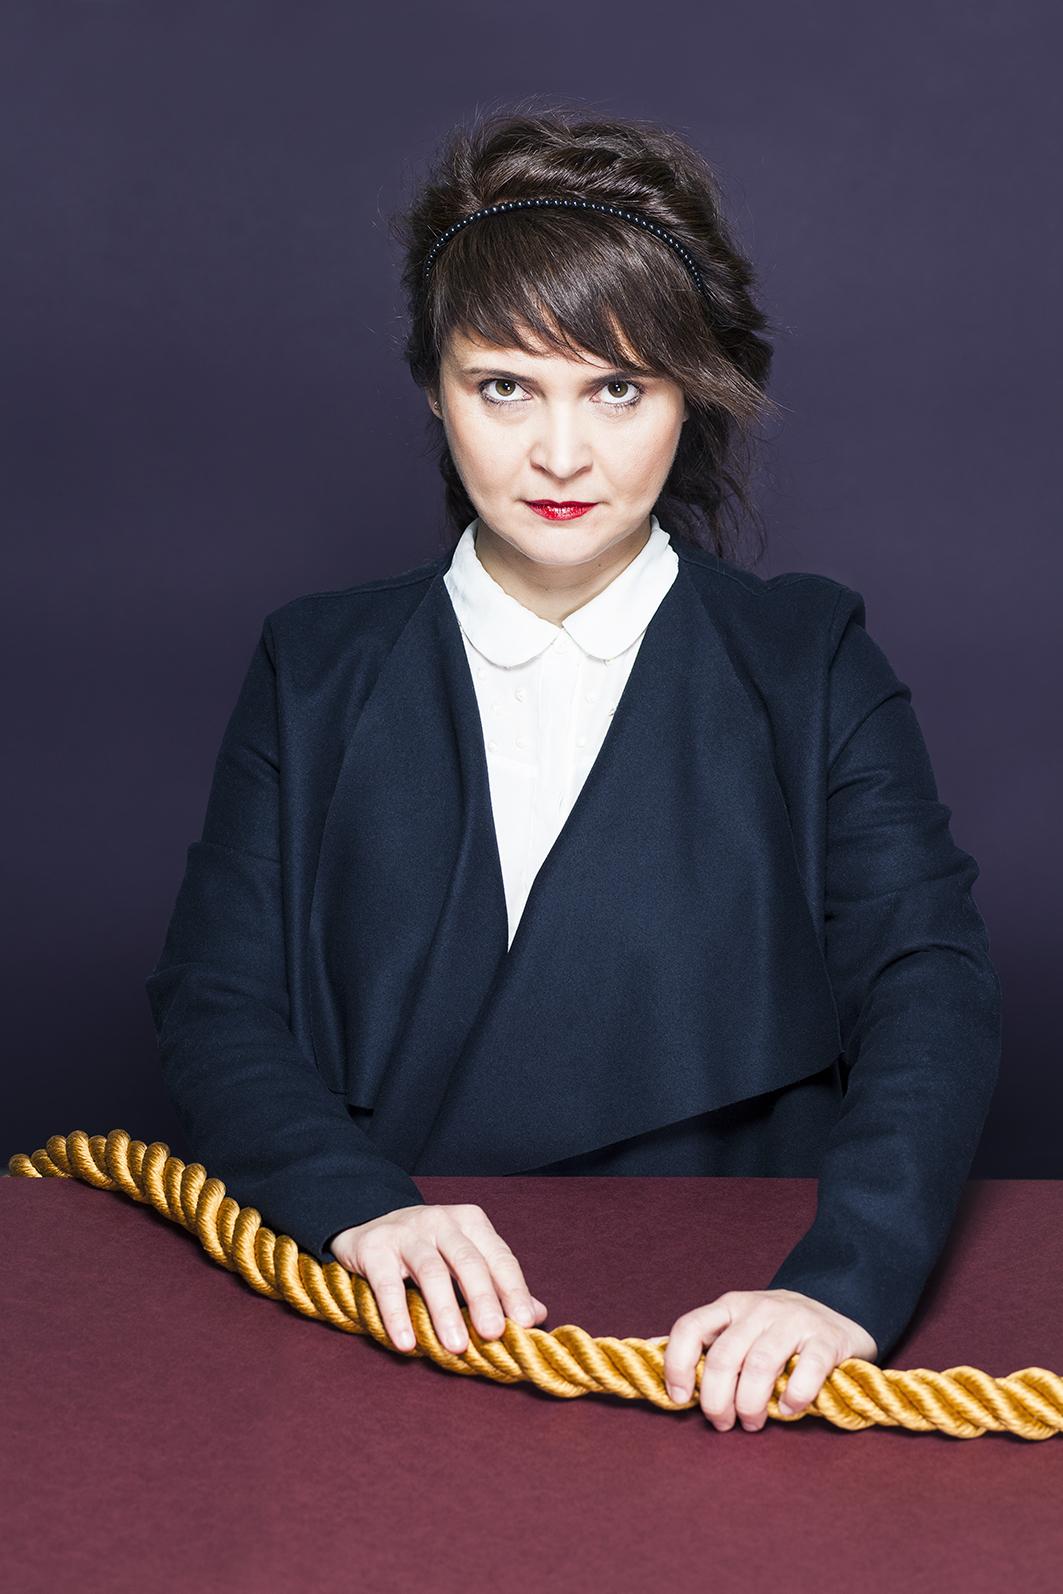 Interview – Milan Tesař for Brno město hudby